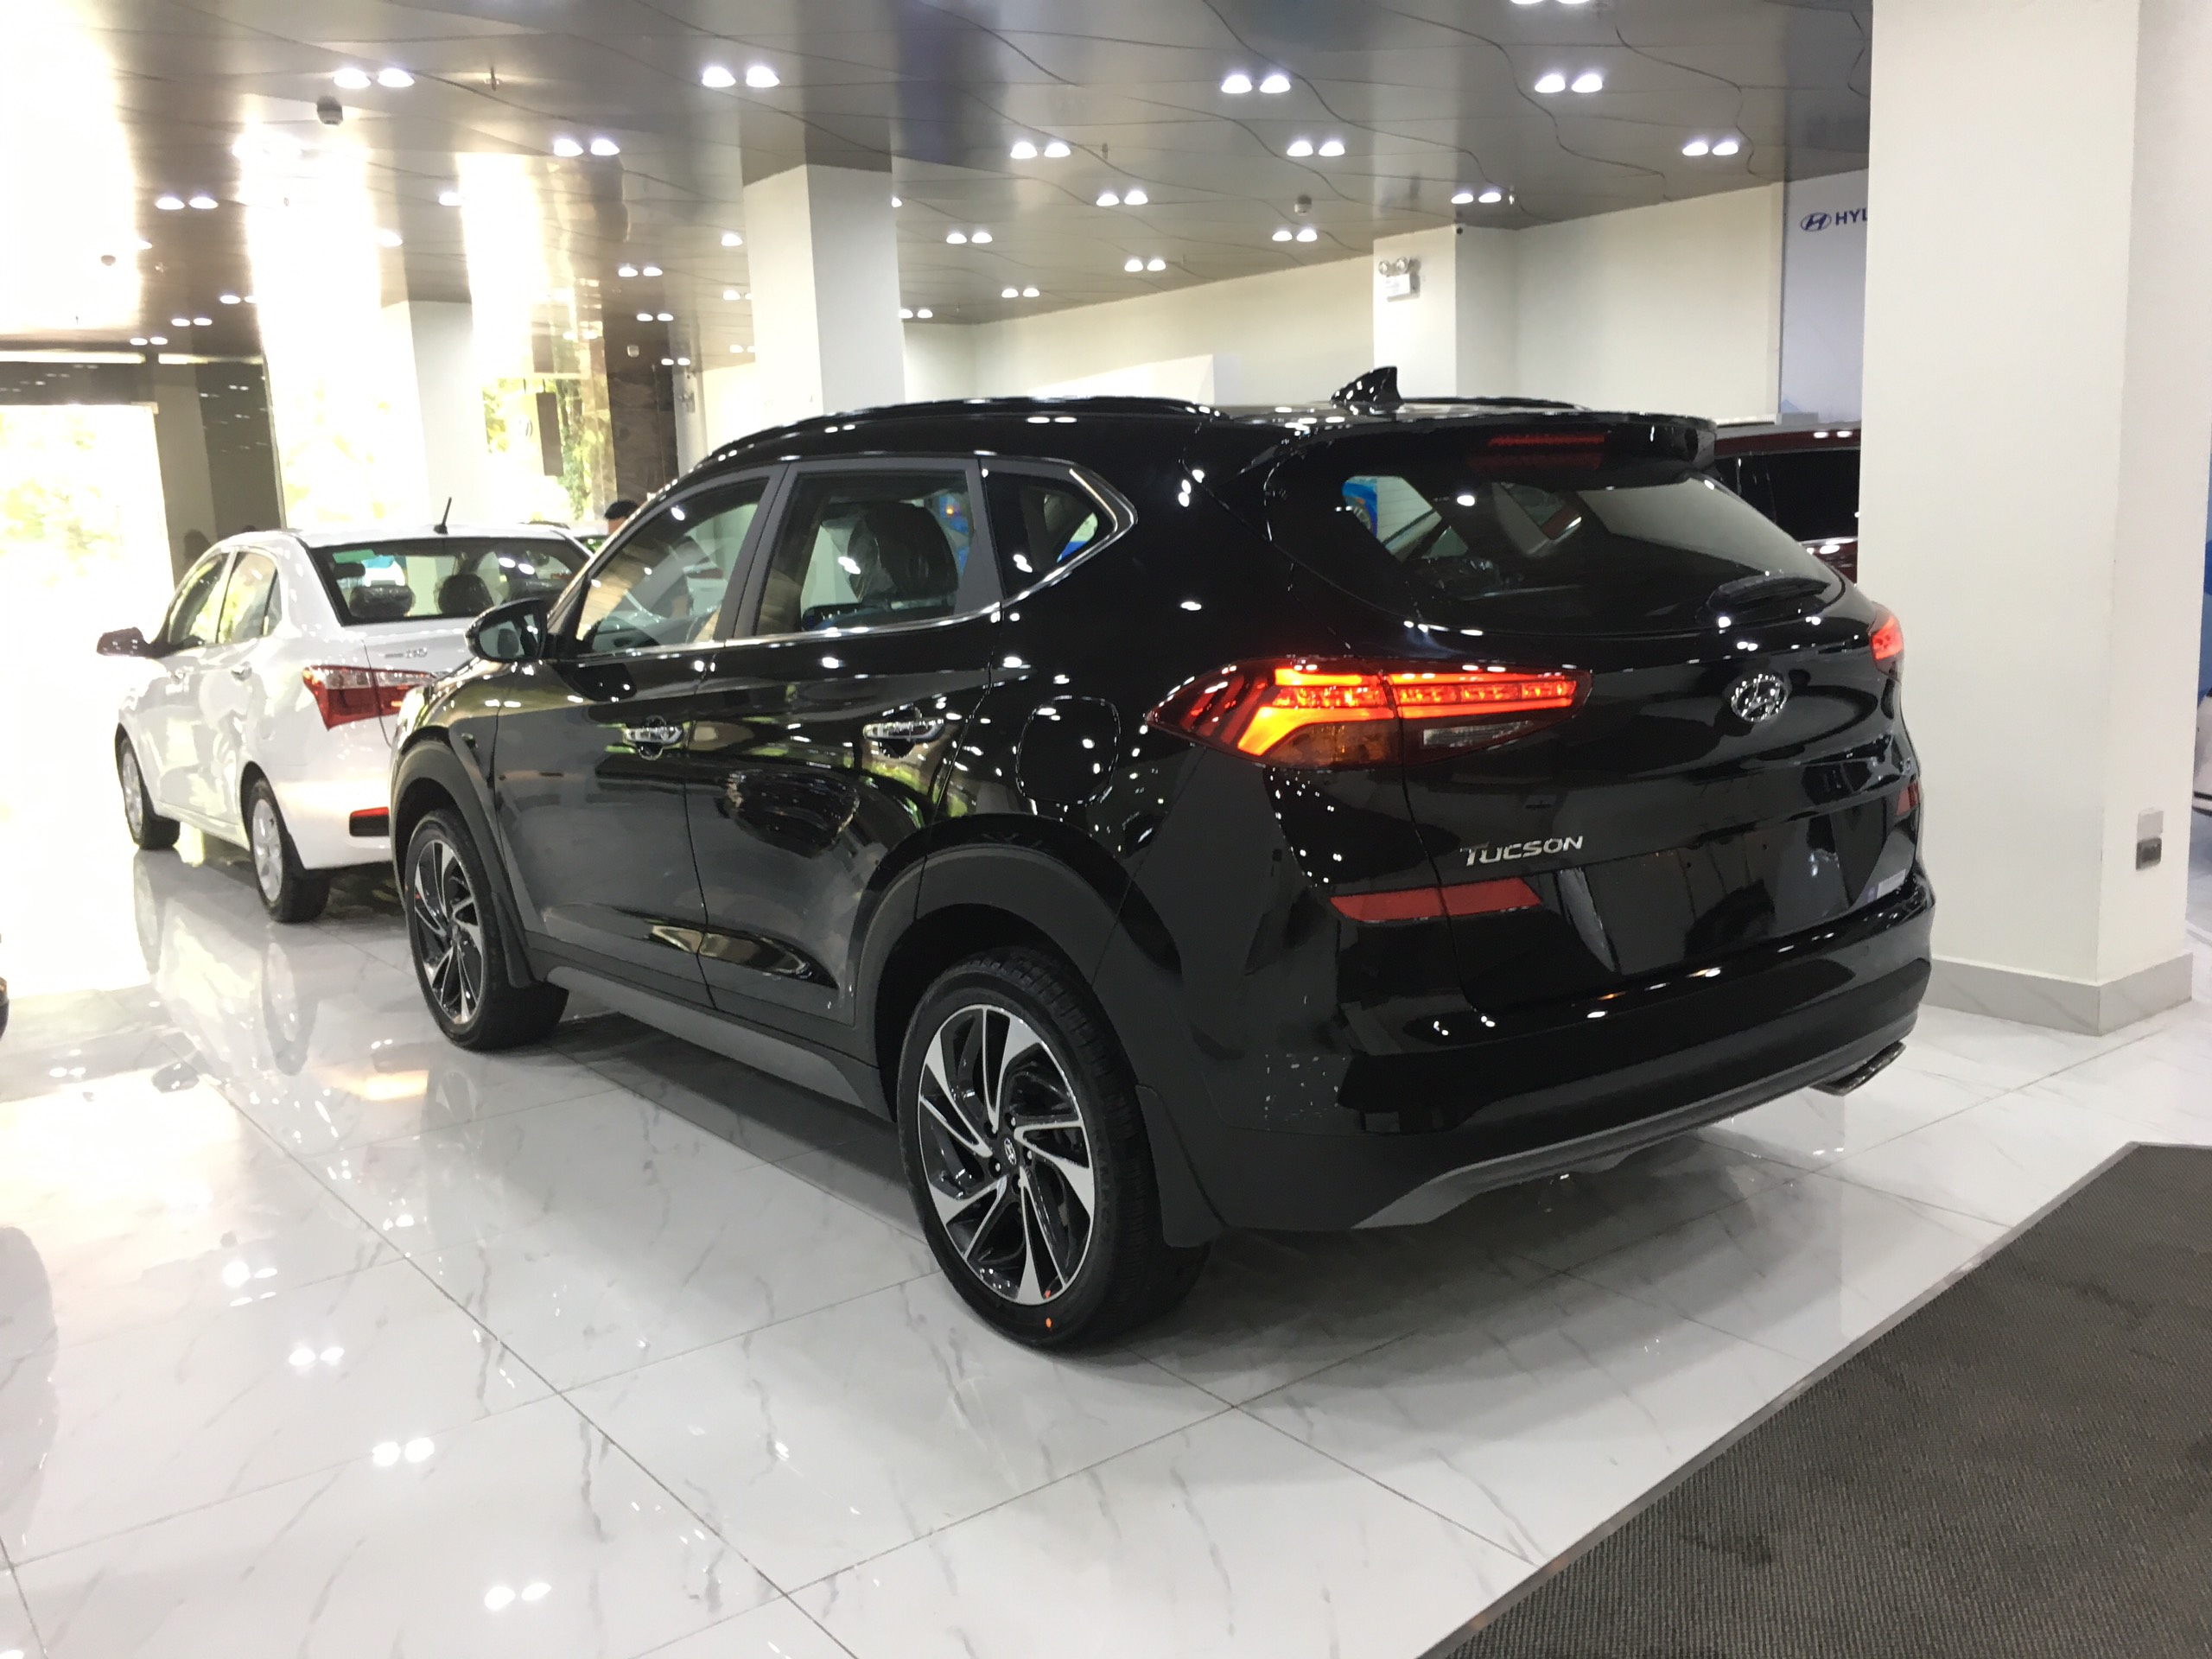 xe tucson 2019